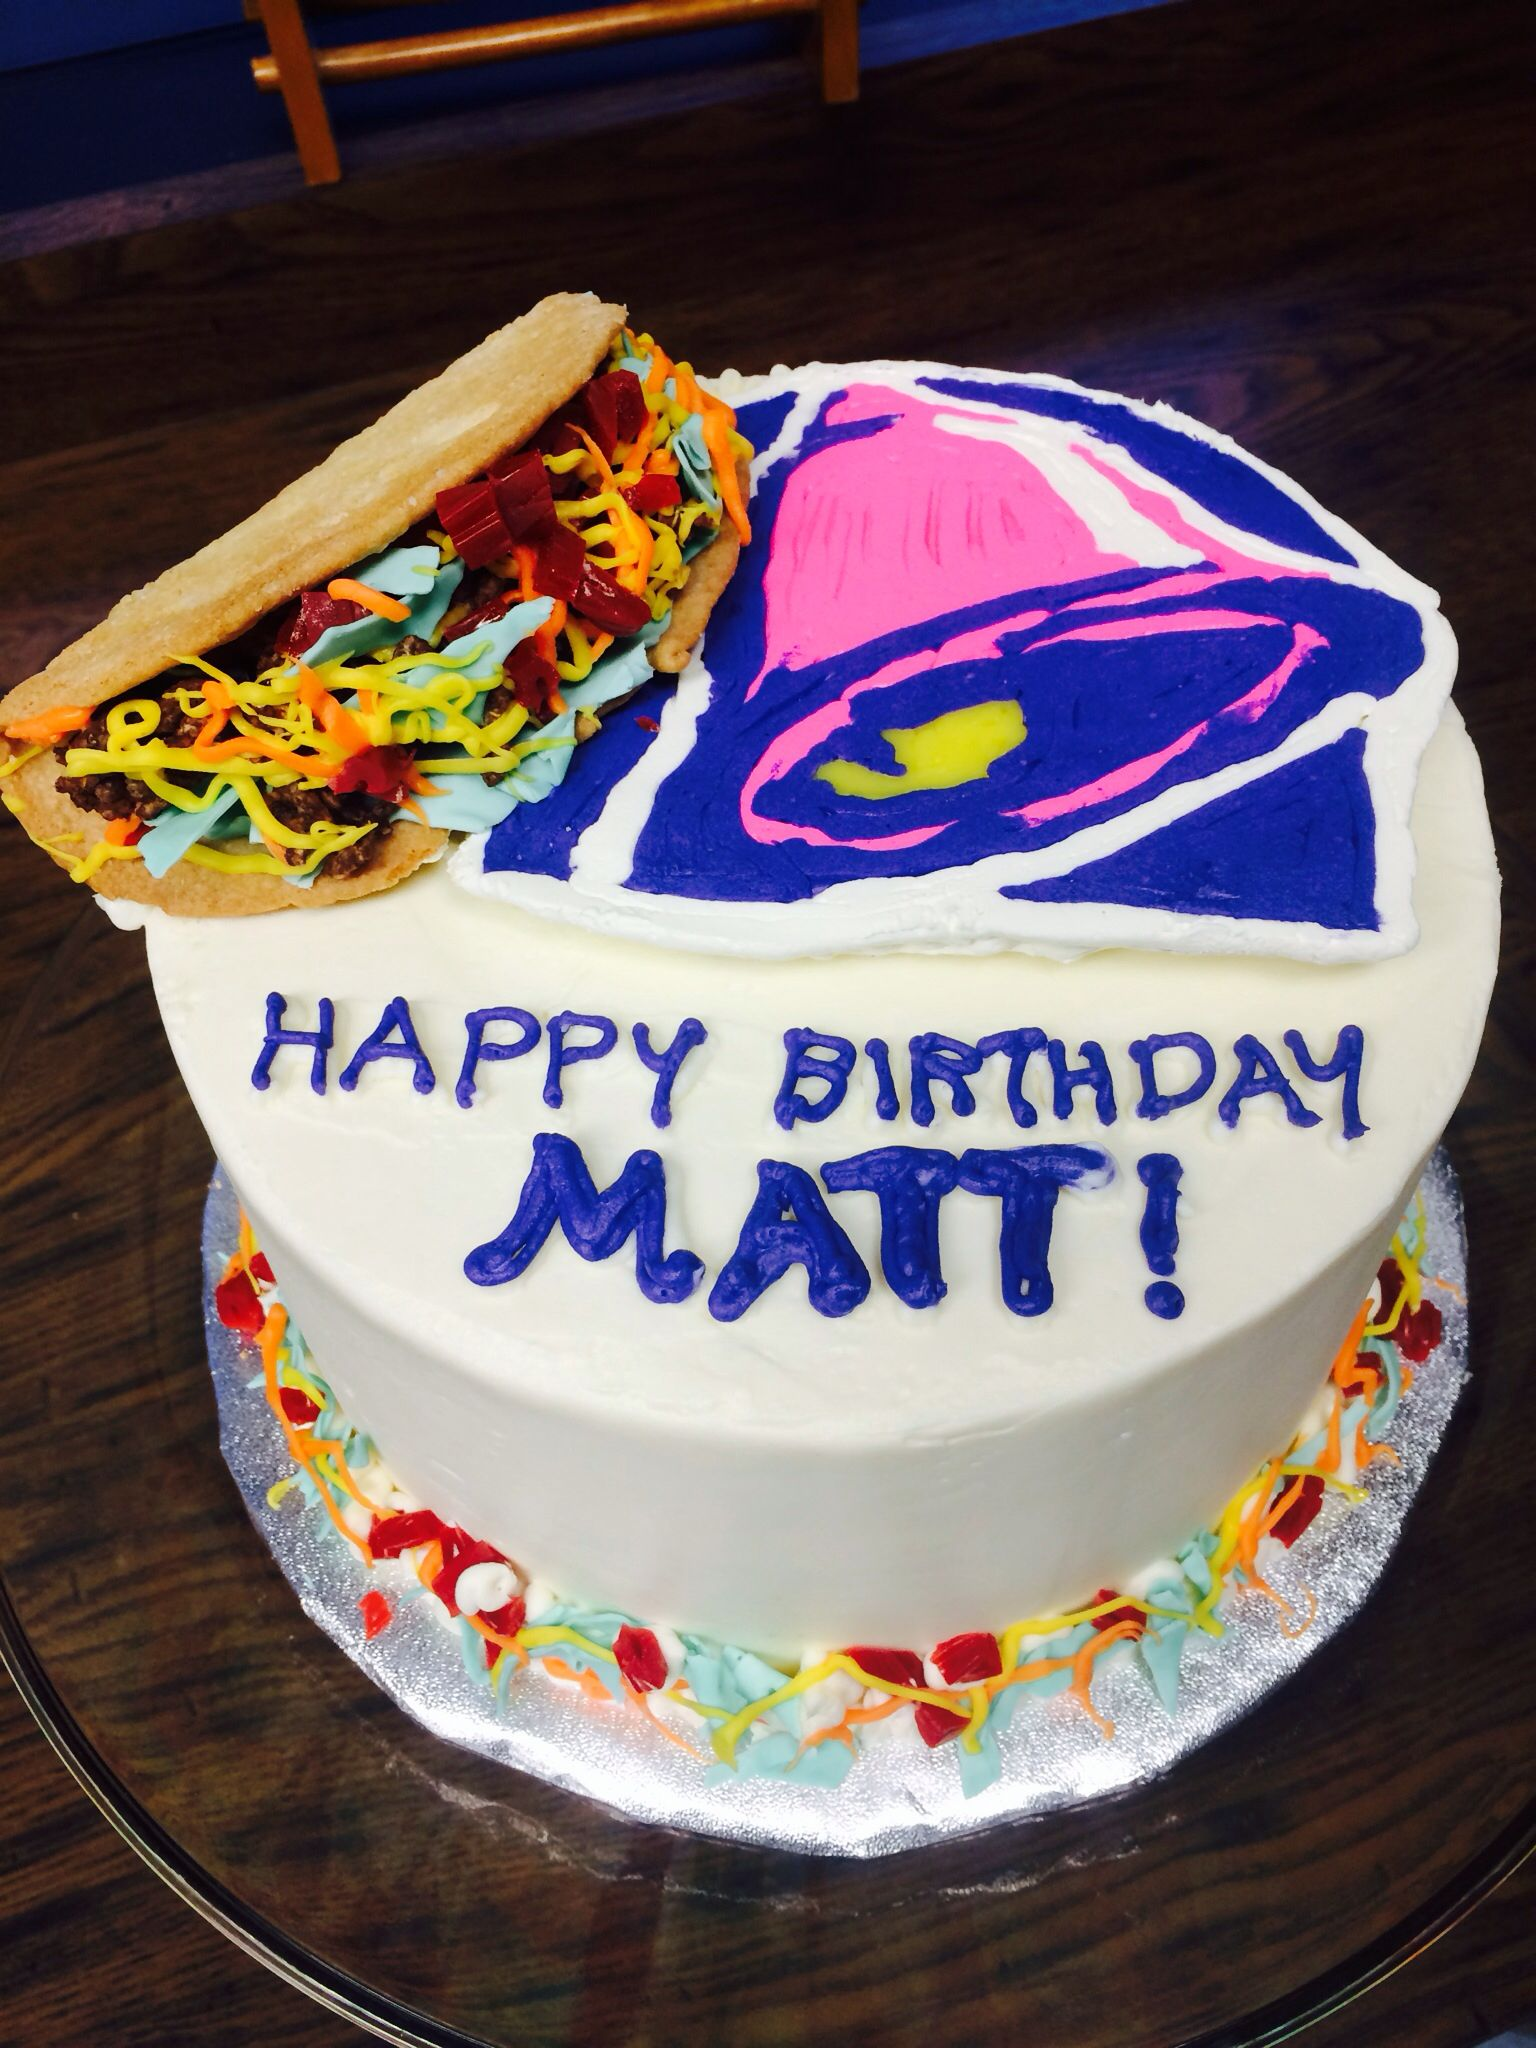 Taco bell theme cake school birthday treats cake